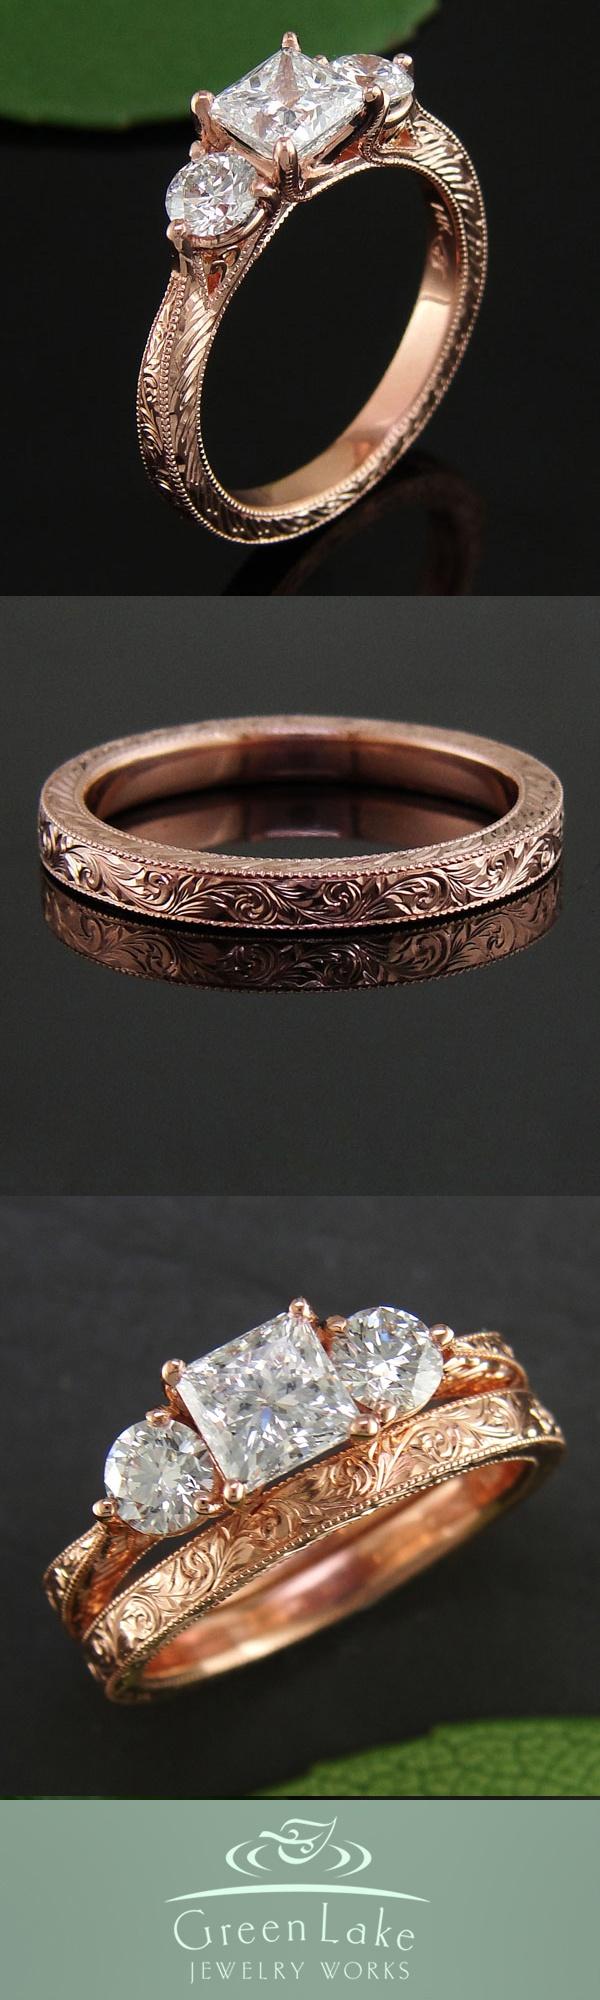 Wedding Set  Estateinspired Wedding Set In Rose Gold With Masterful  Engraving Worked Into